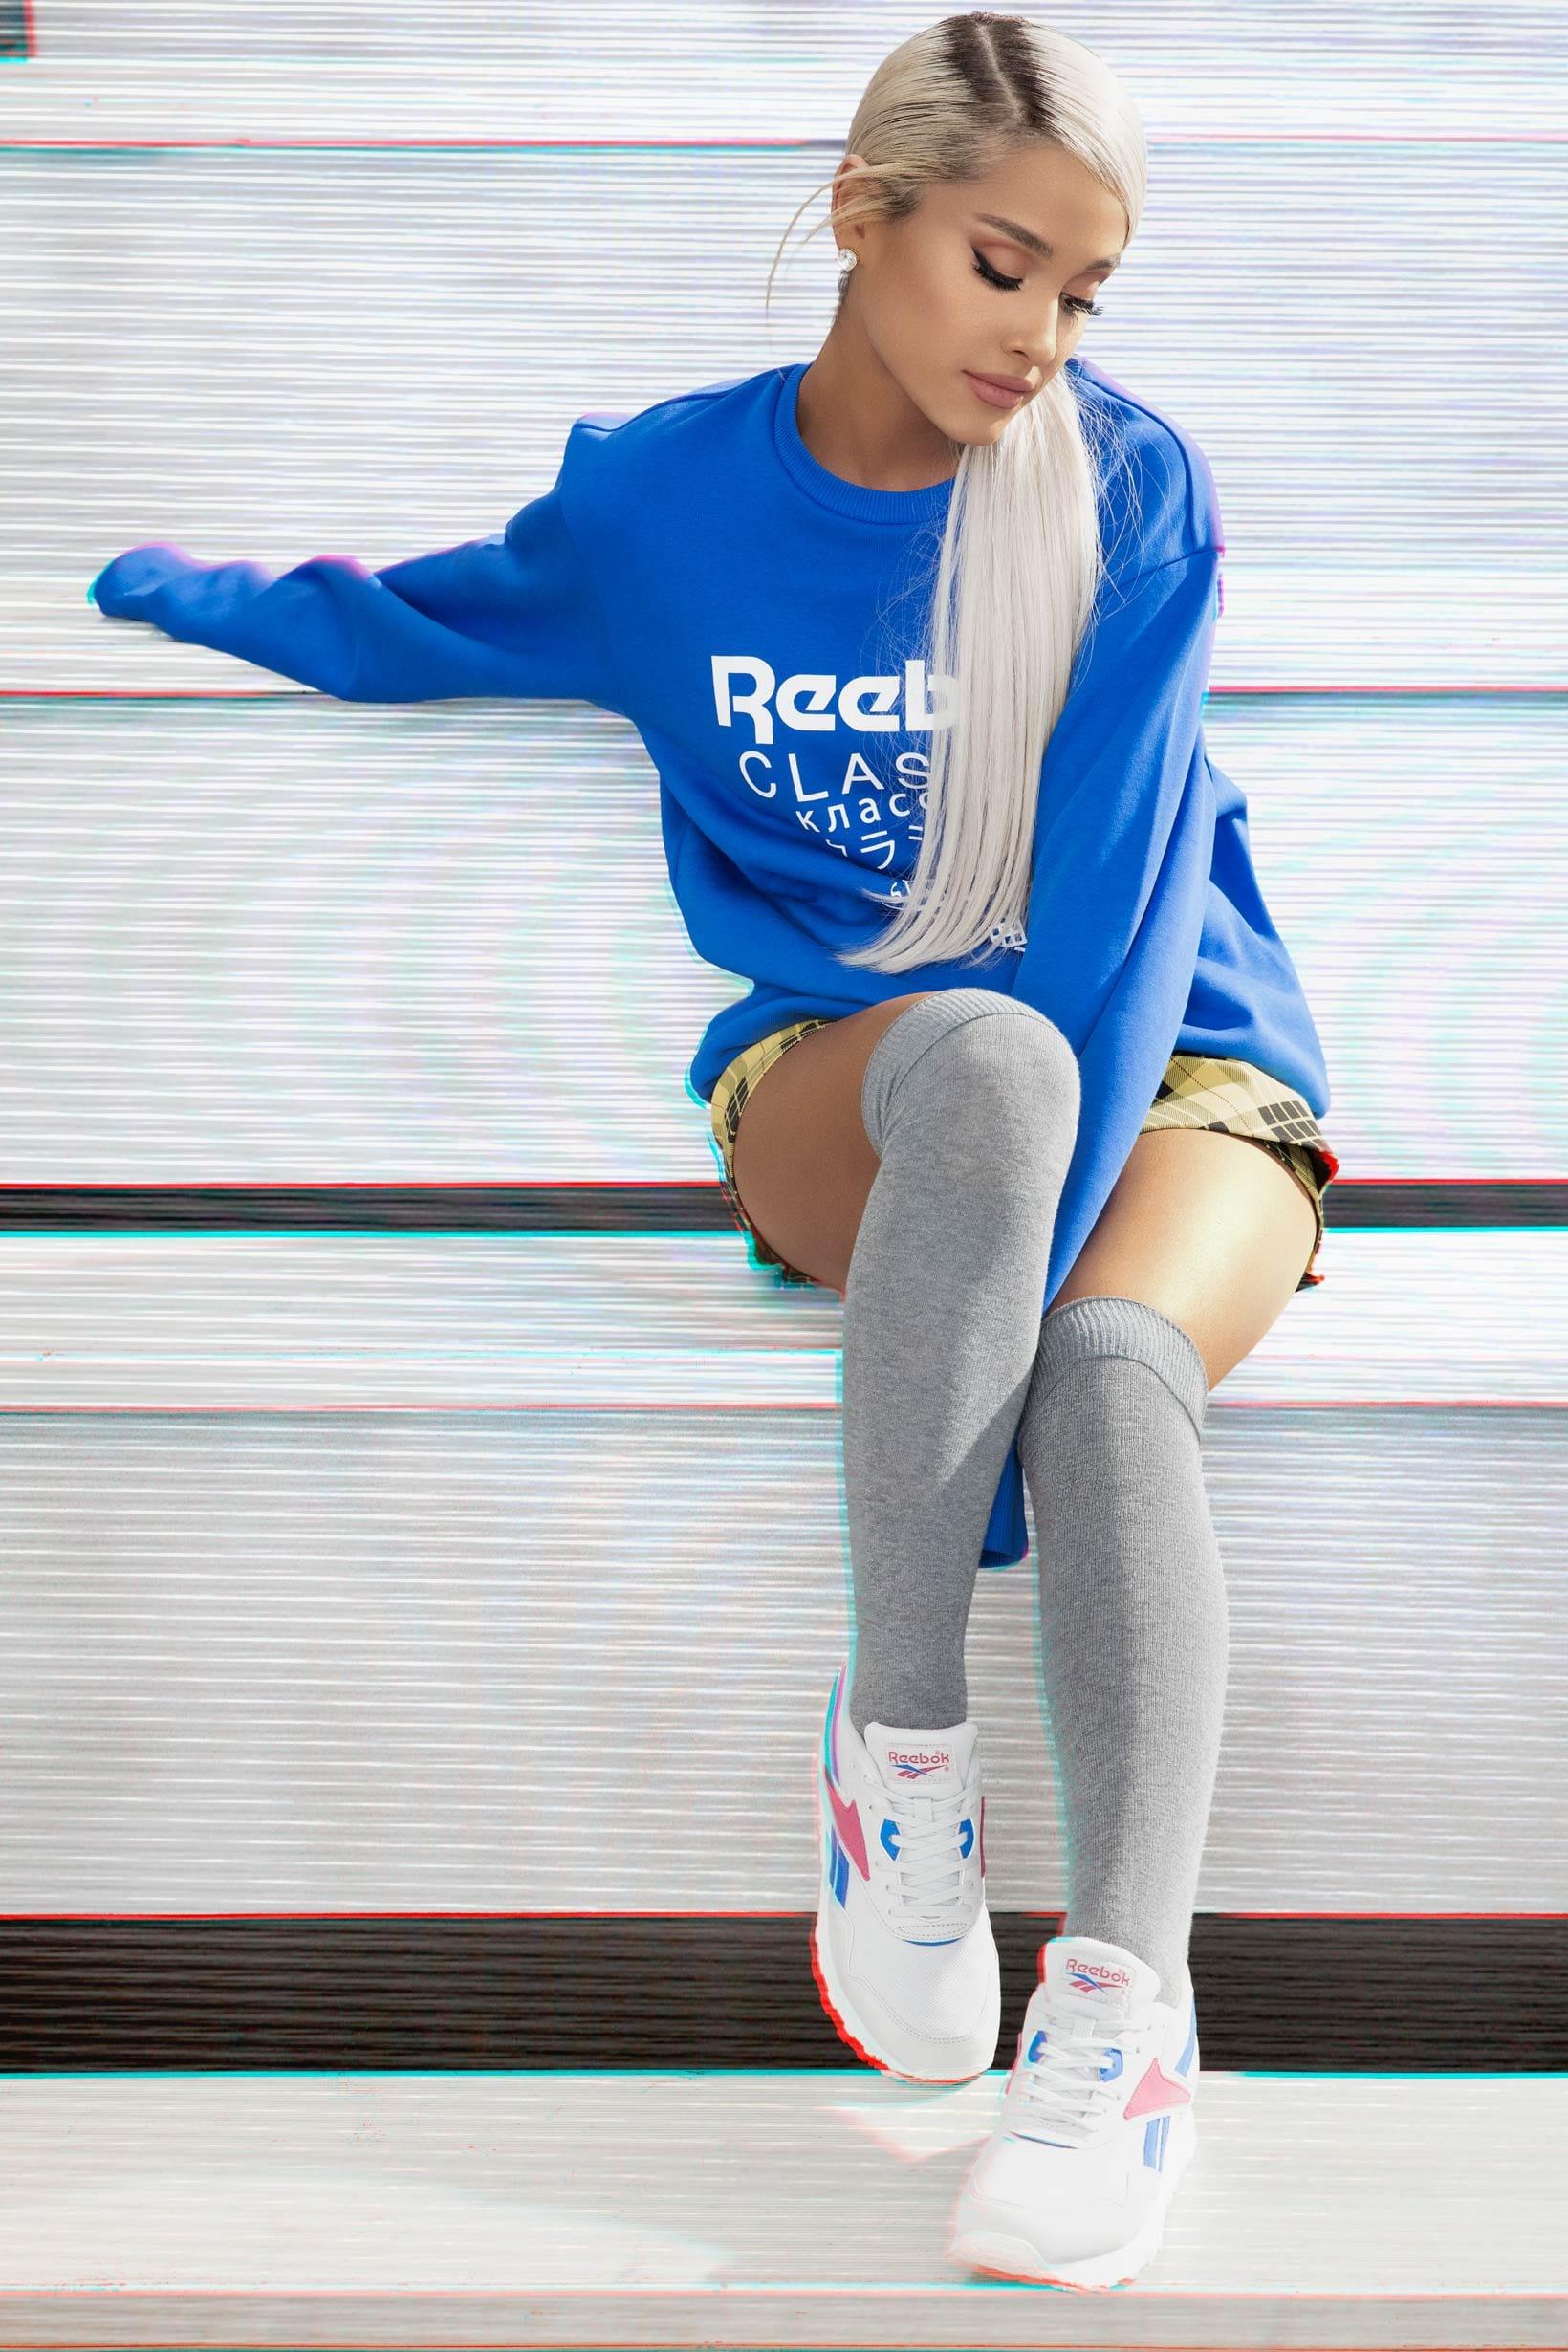 Get Ariana Grande's Look With Reebok's